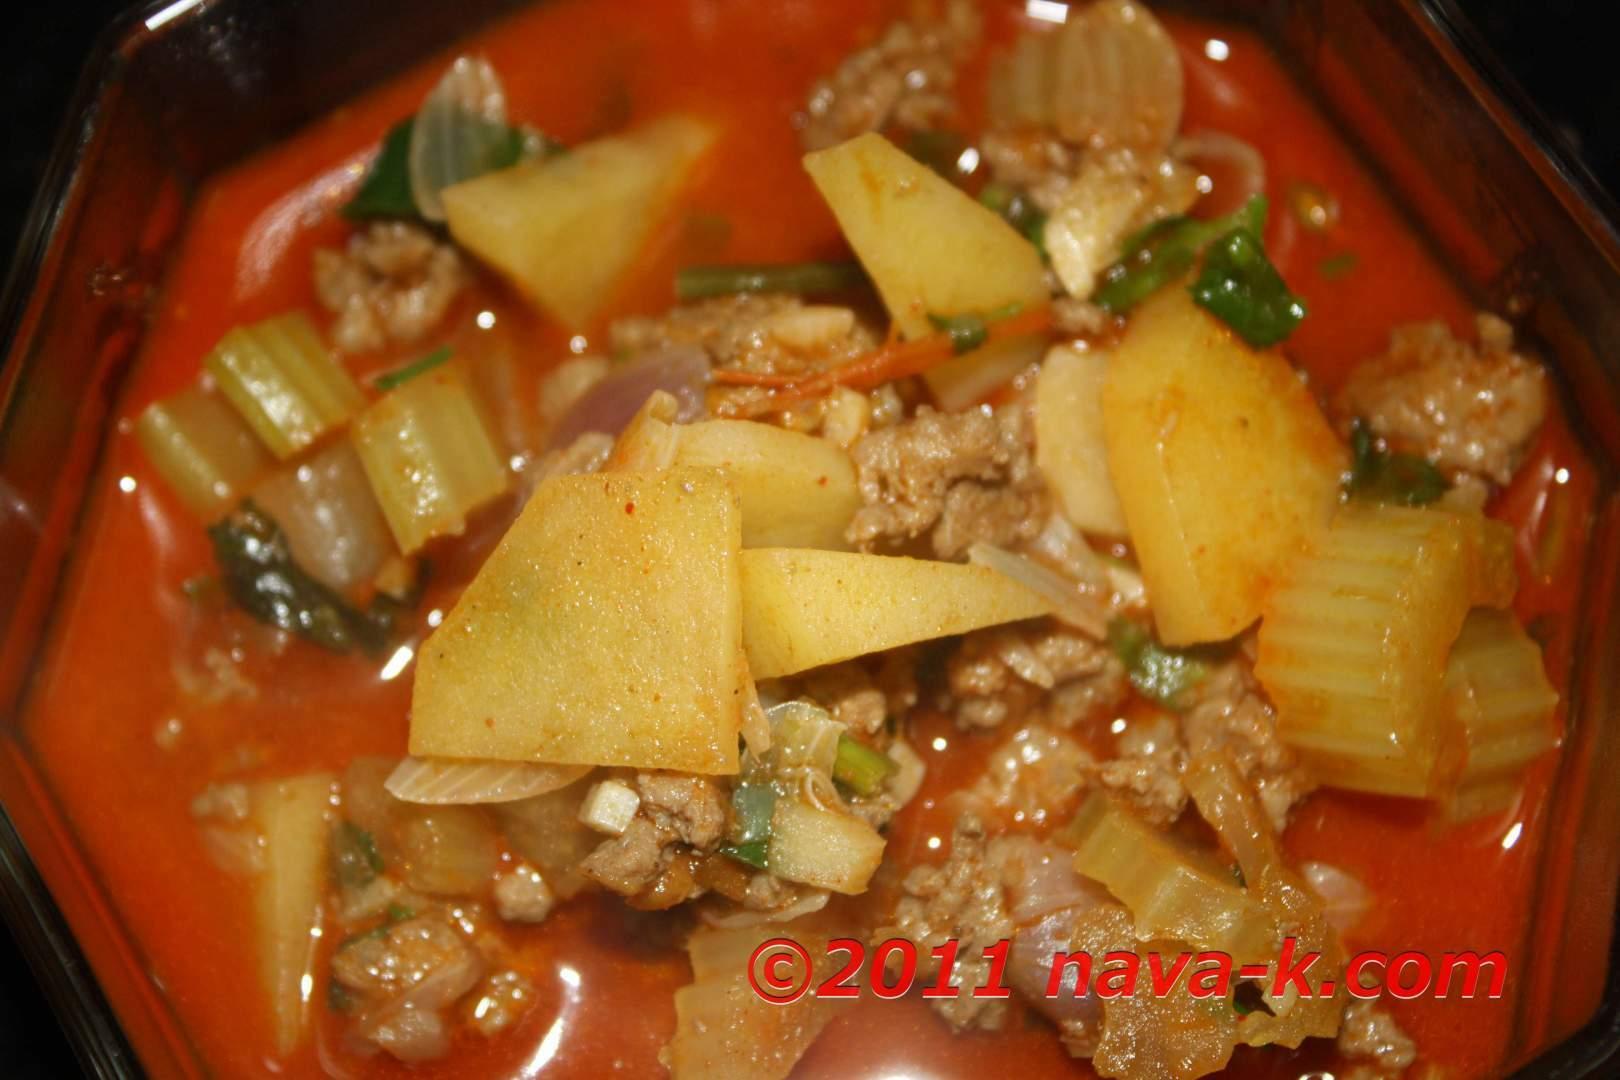 Spicy lamb stew, Recipe Petitchef